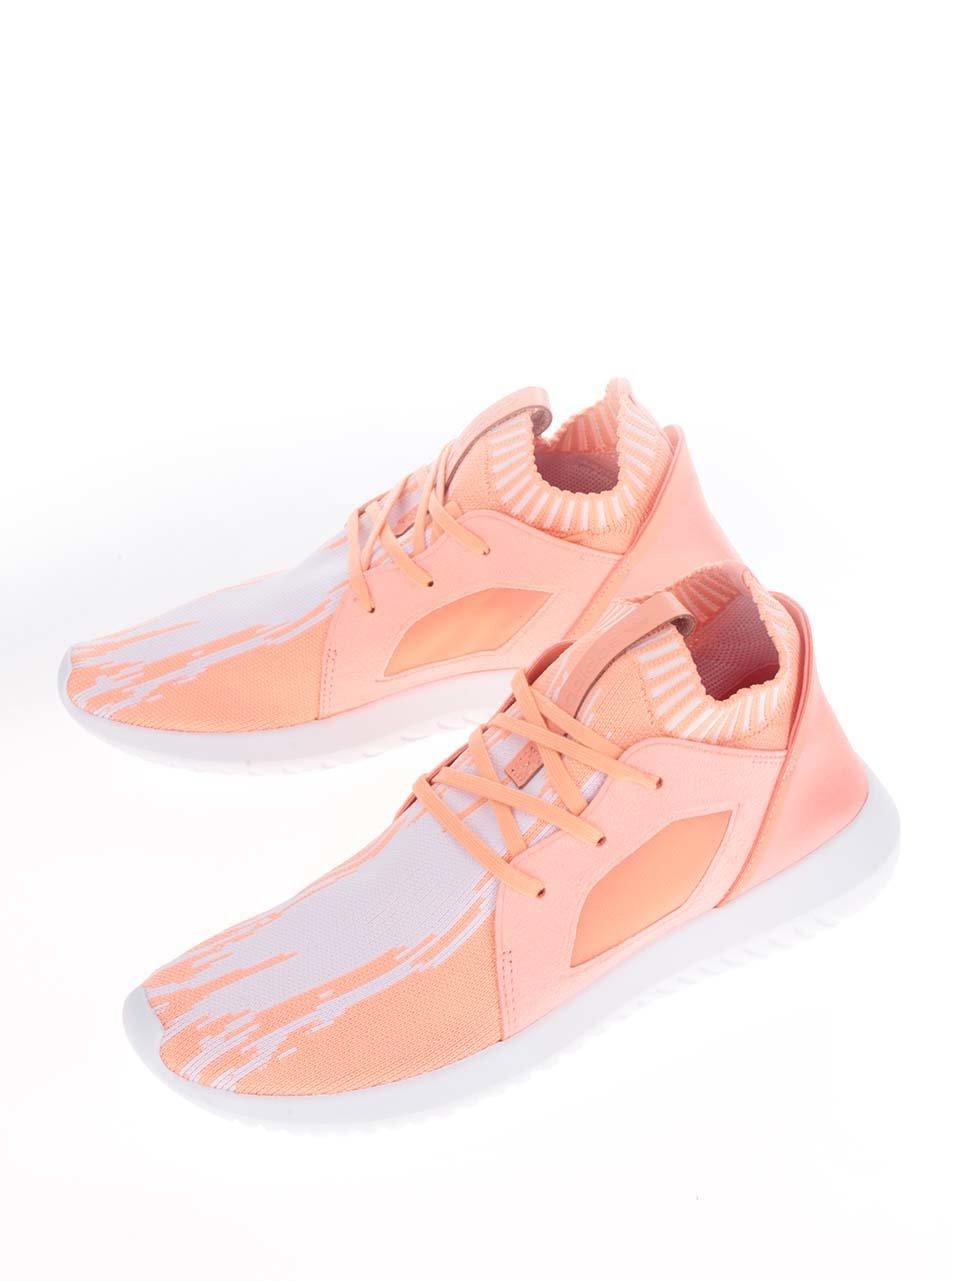 Oranžové dámské tenisky adidas Originals Tubular Defiantpk ... c20e28b5eb1